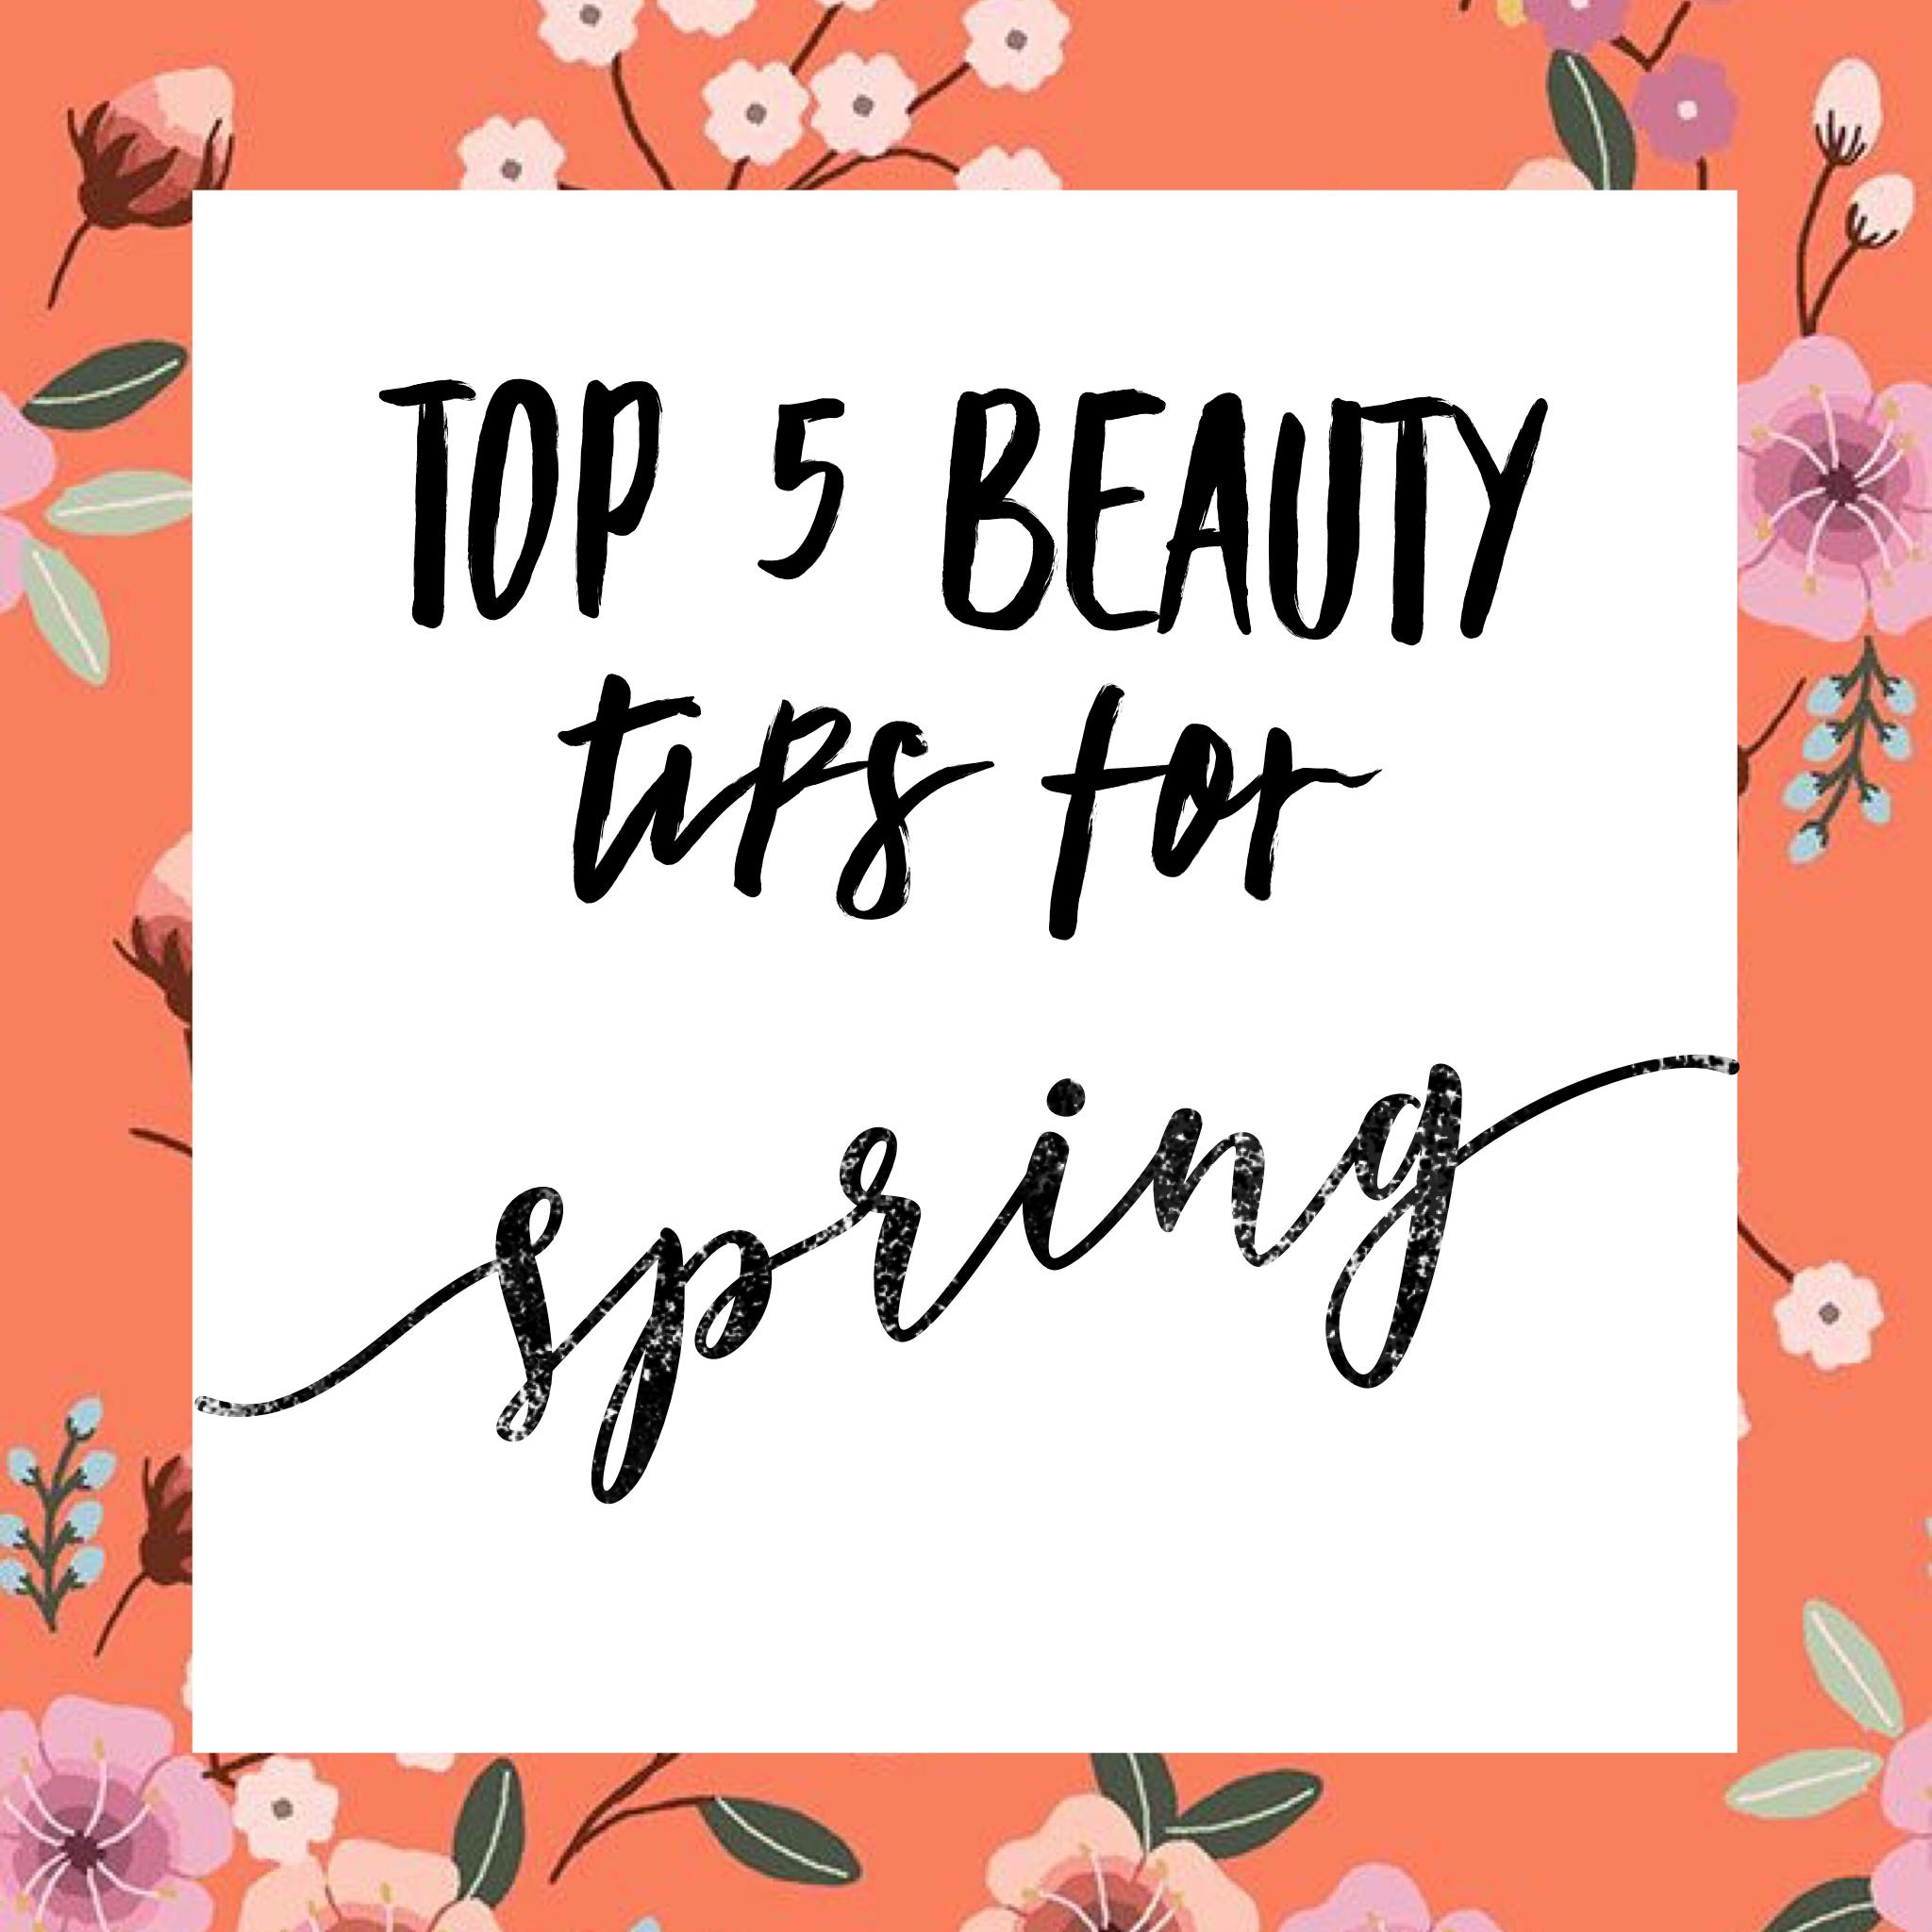 Top 10 Beauty Tips for Spring – Alyssa May Wilson